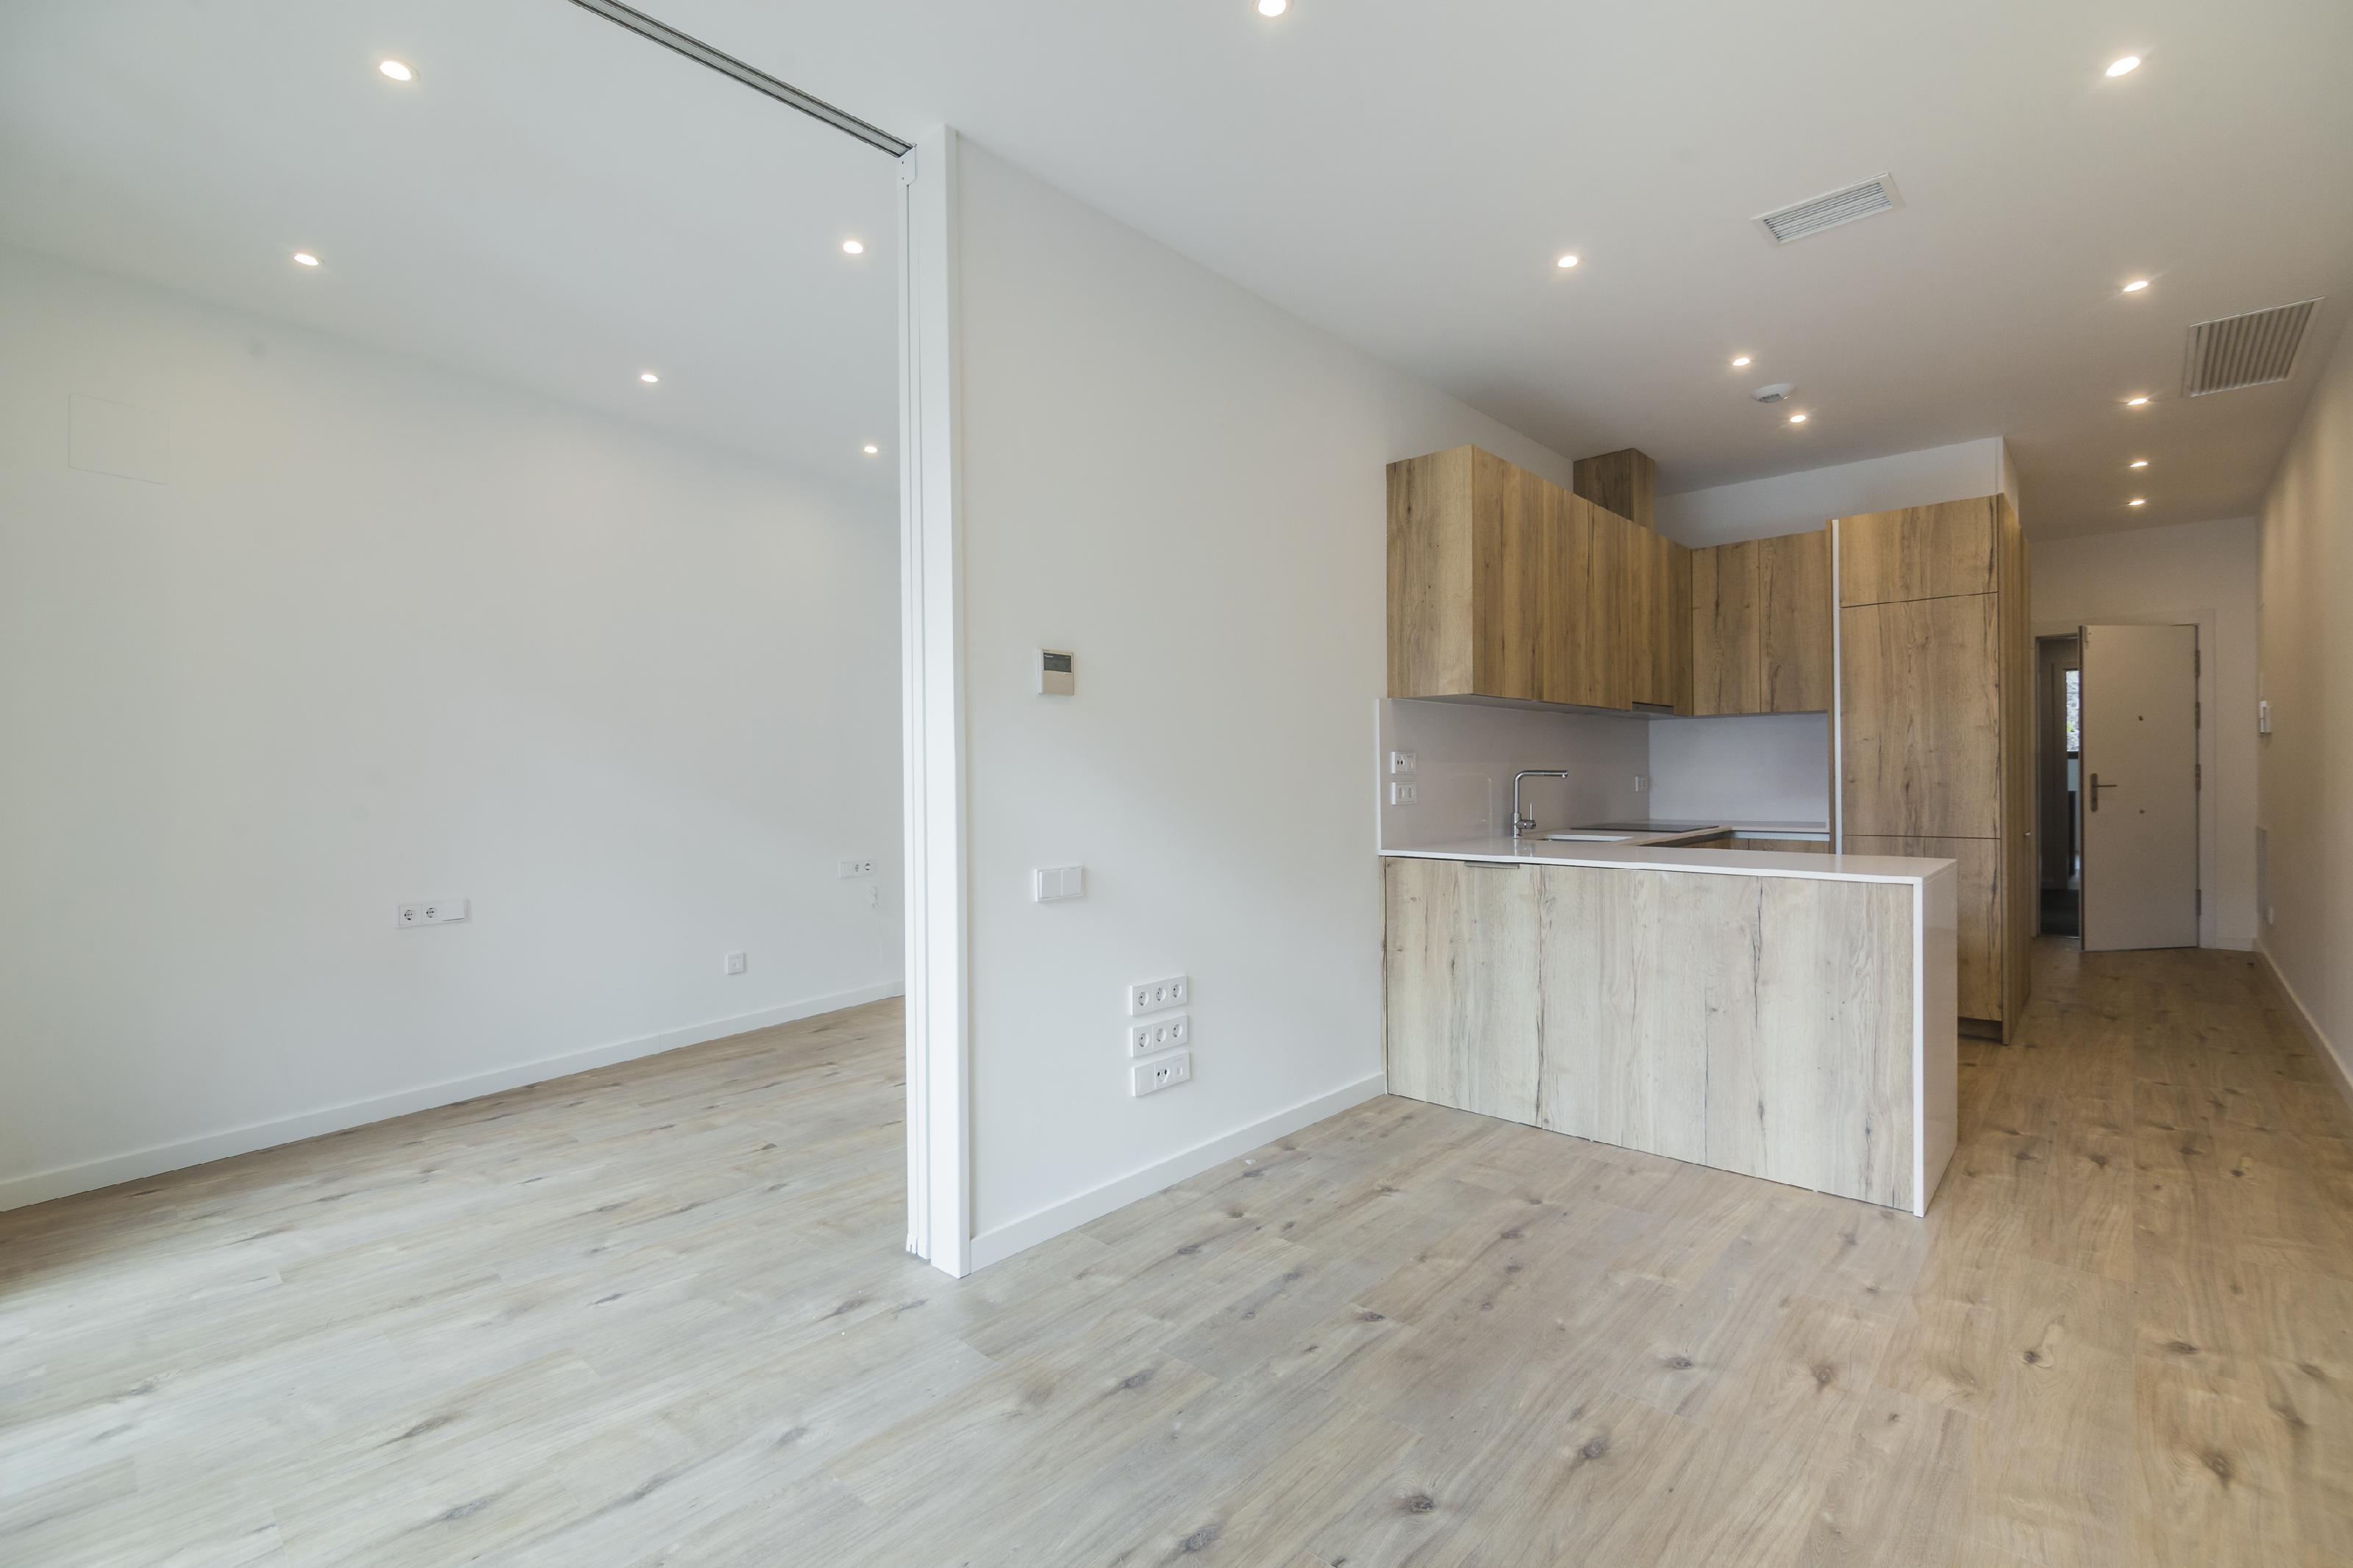 249858 Flat for sale in Eixample, Nova Esquerra Eixample 1